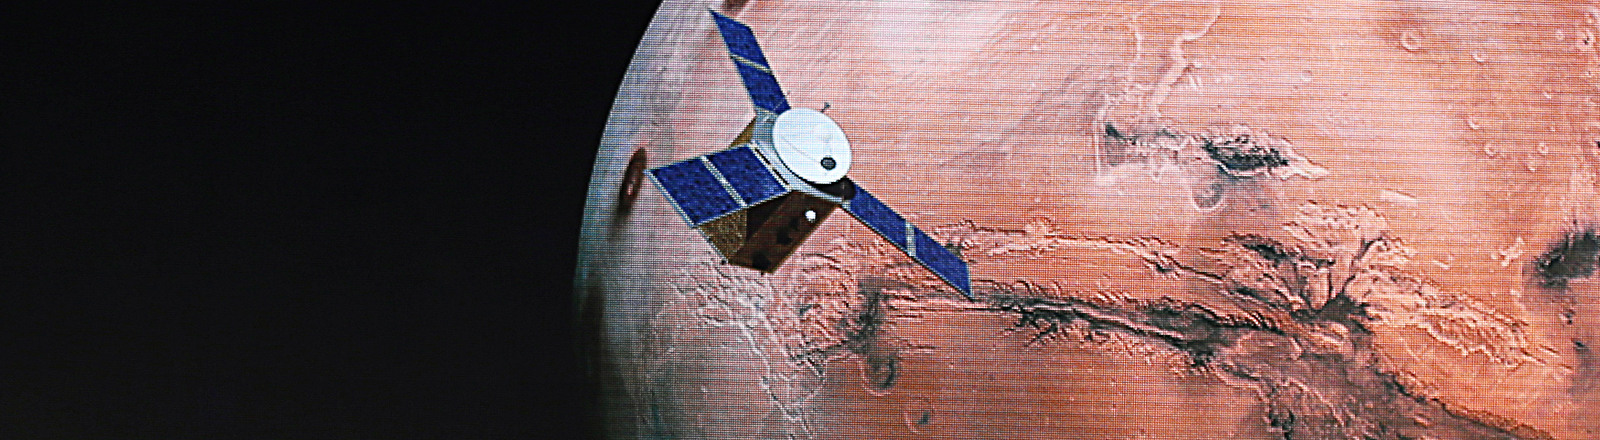 Illustration der Marssonde Hope vor dem roten Planeten Mars; Foto: dpa